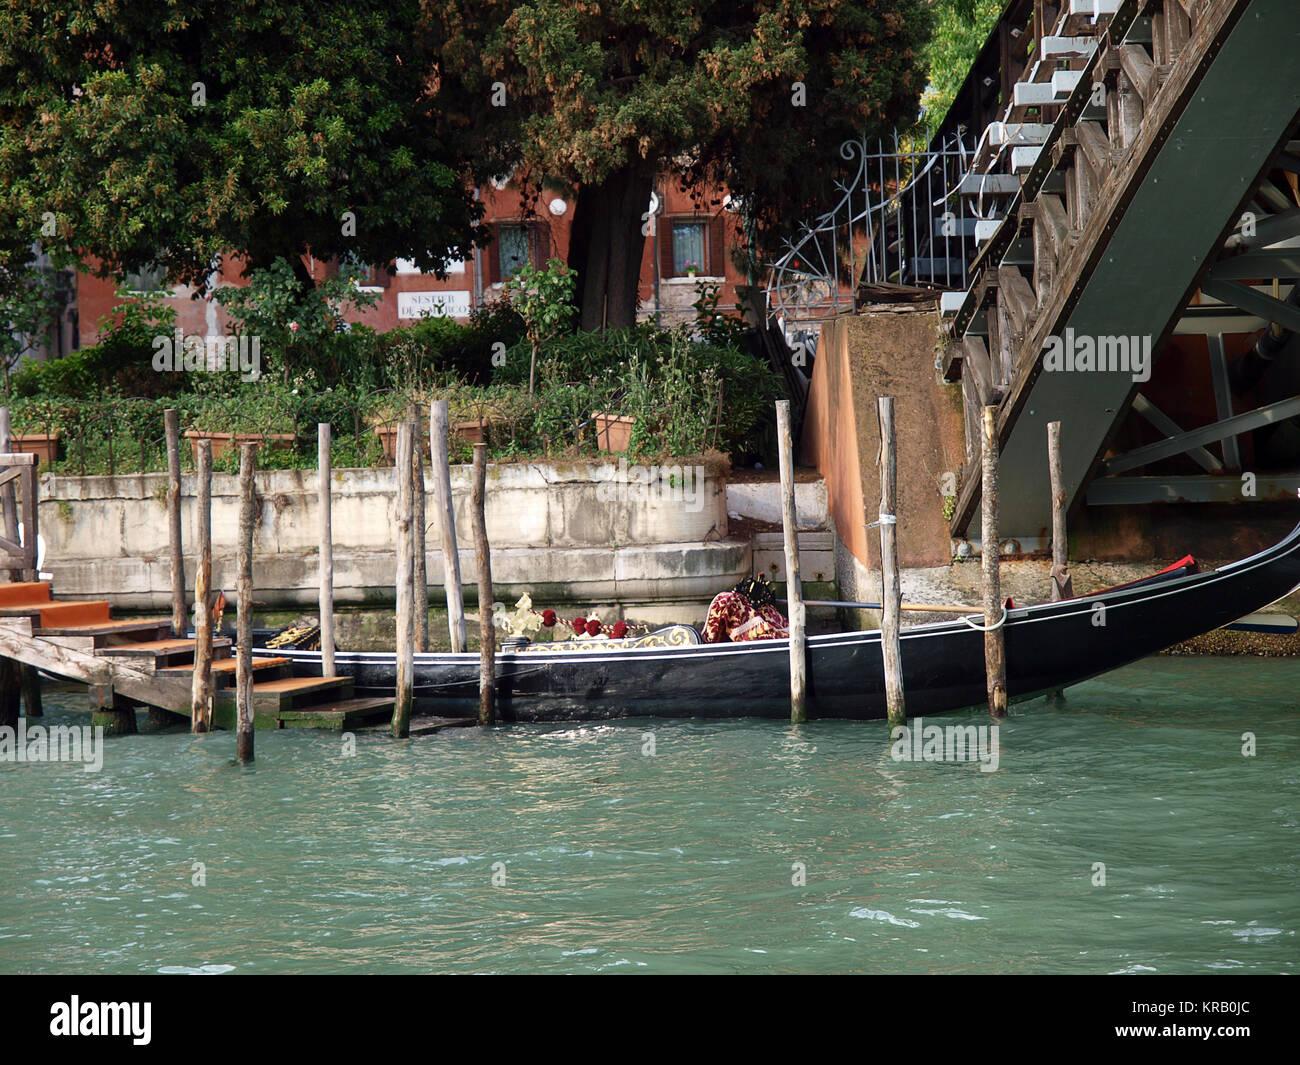 Venice - Gondola at the bridge Academia - Stock Image